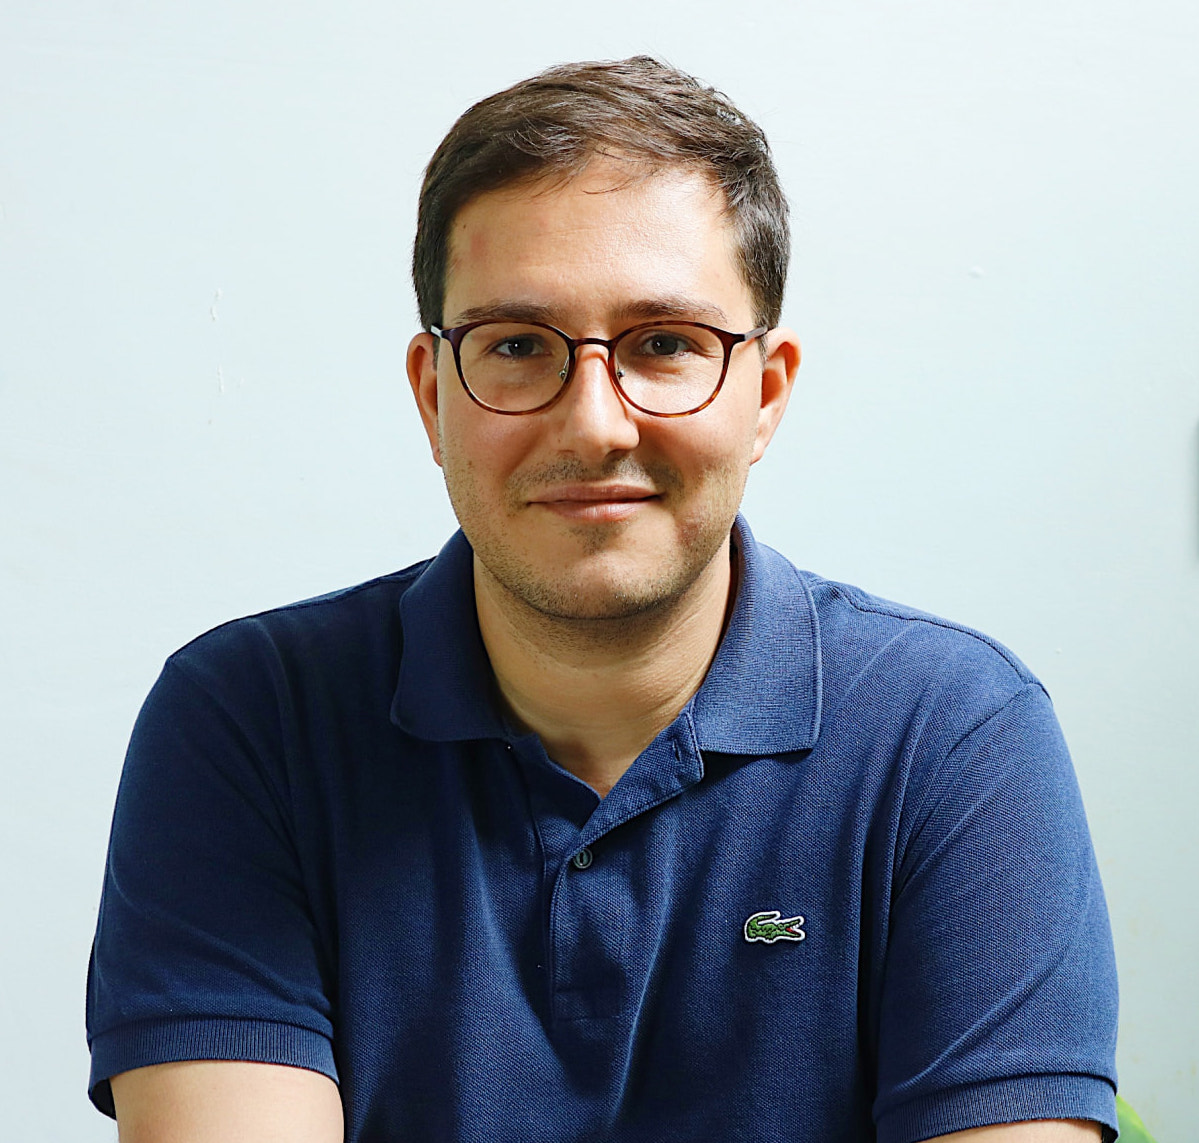 Emmanuel Faja, Grow instructor and managing partner of Mäd.